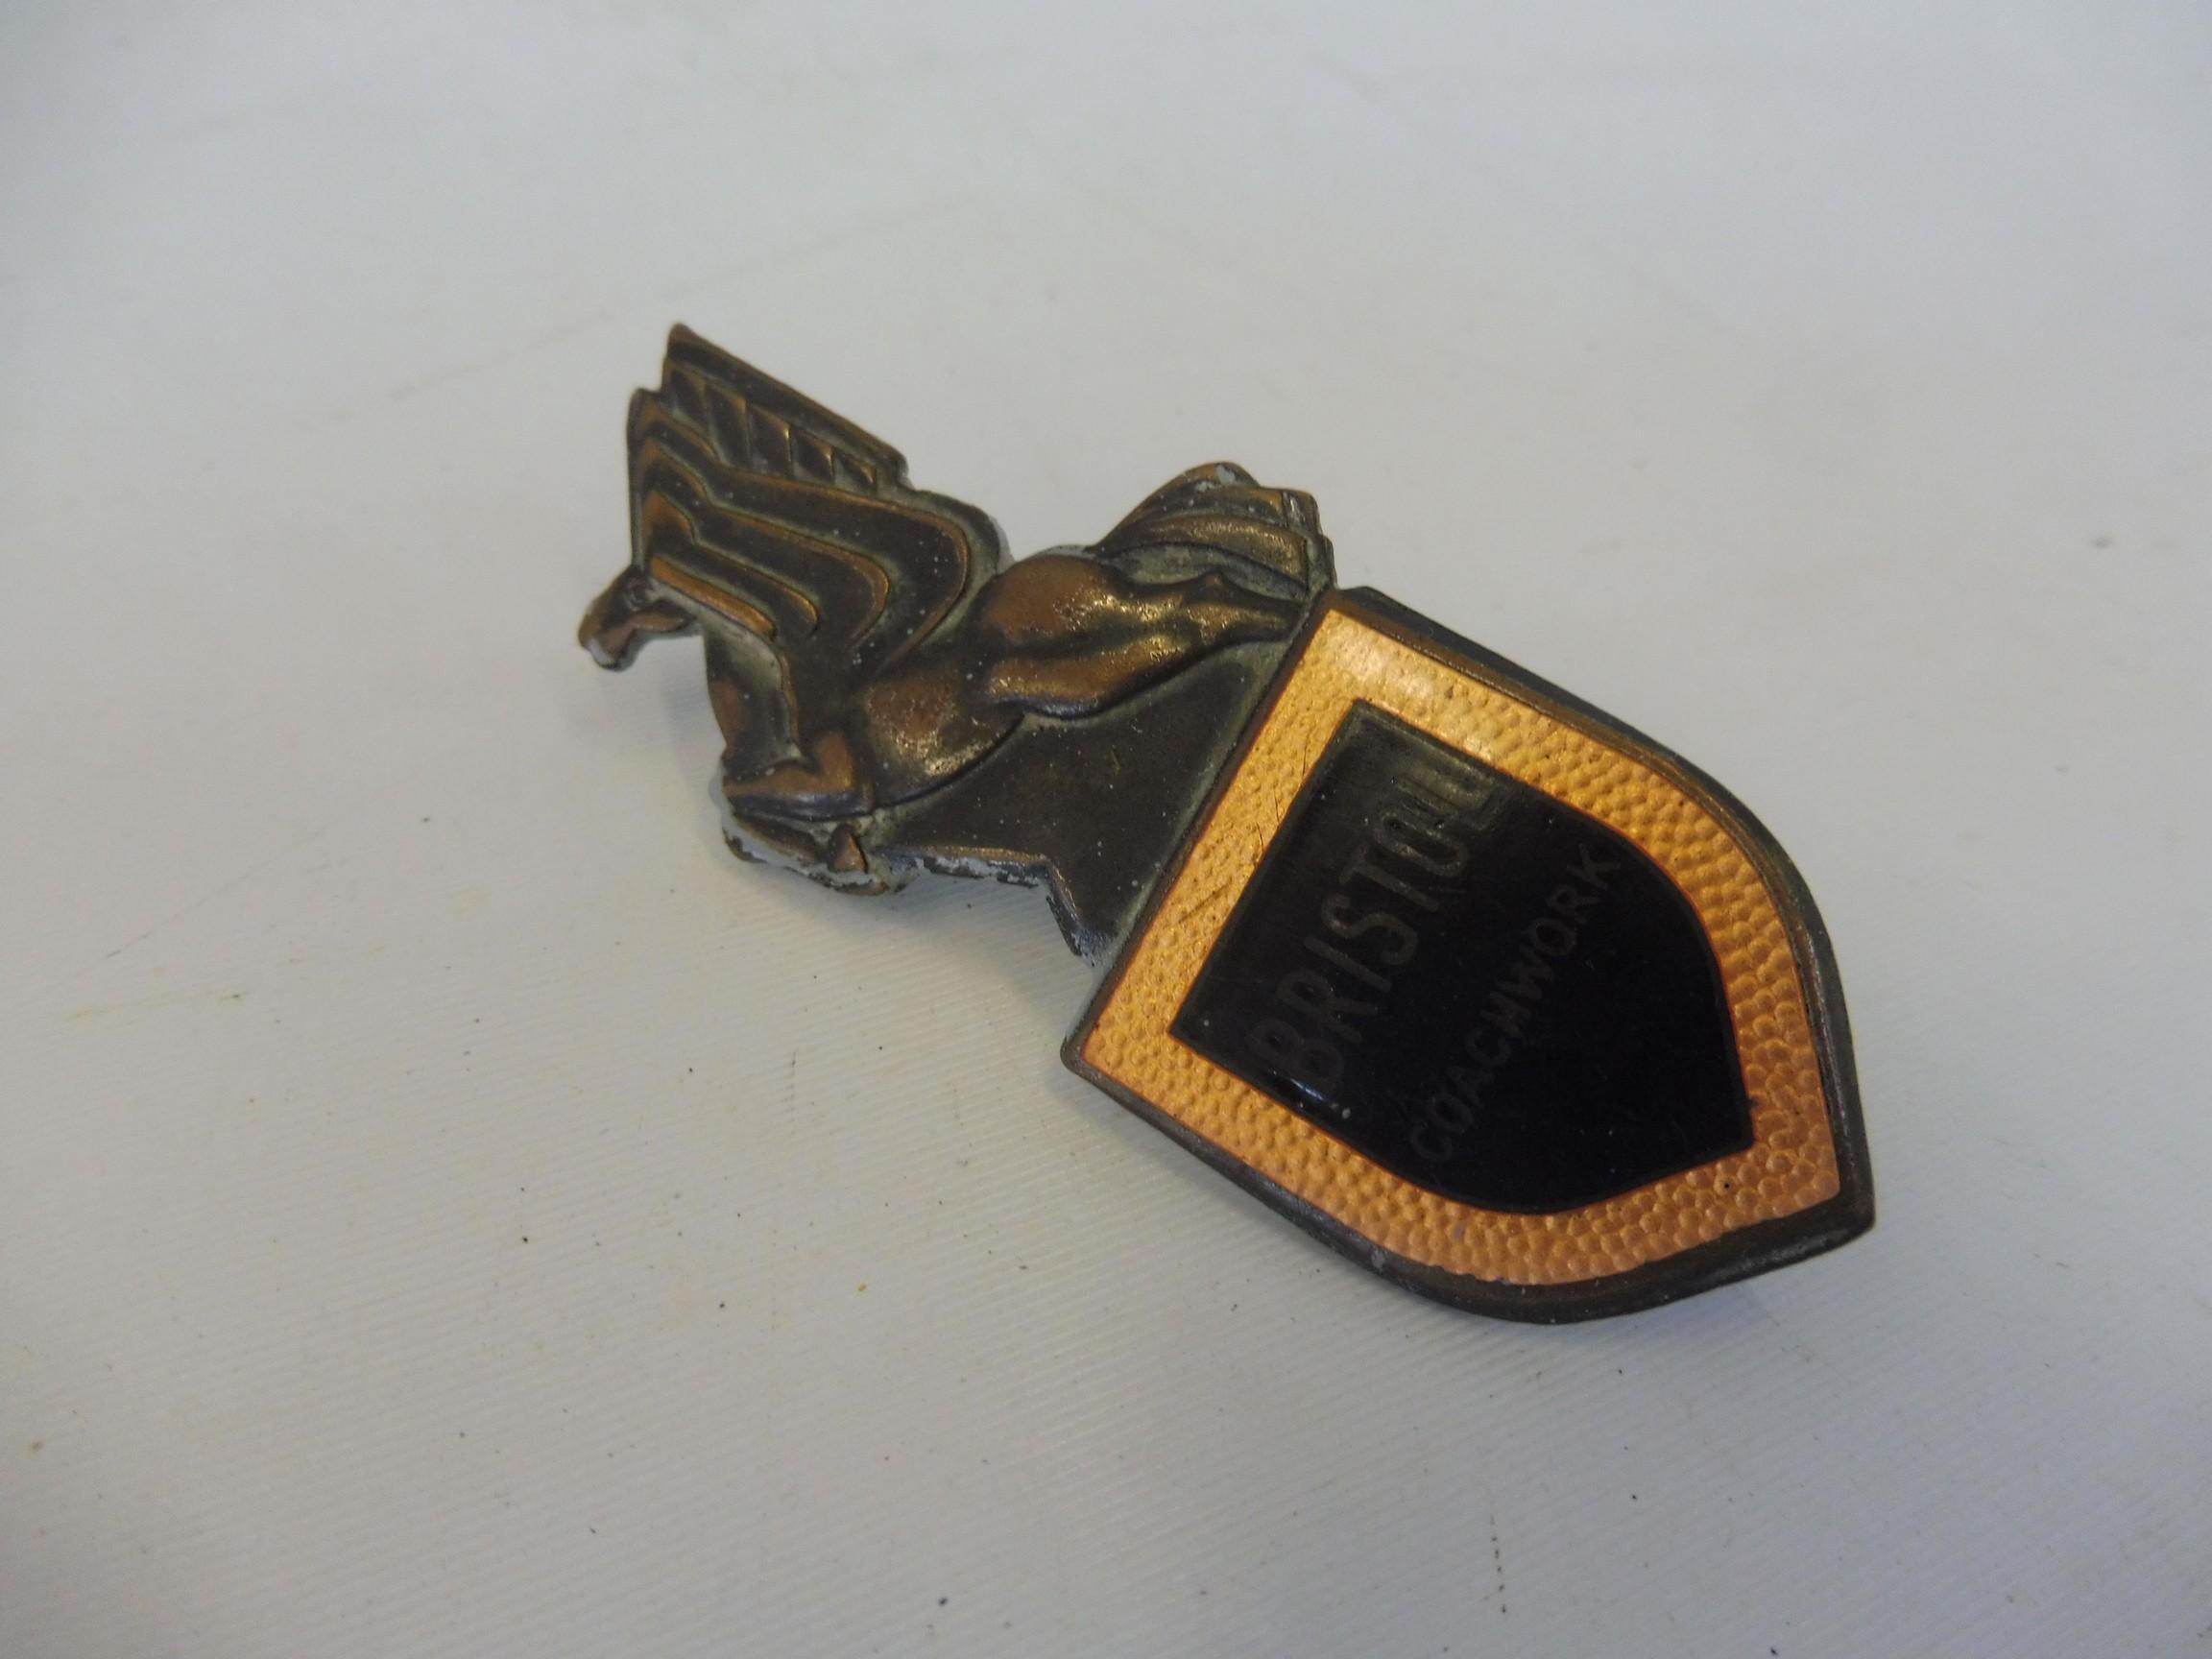 A Bristol coachbuilder's enamel side trim badge.